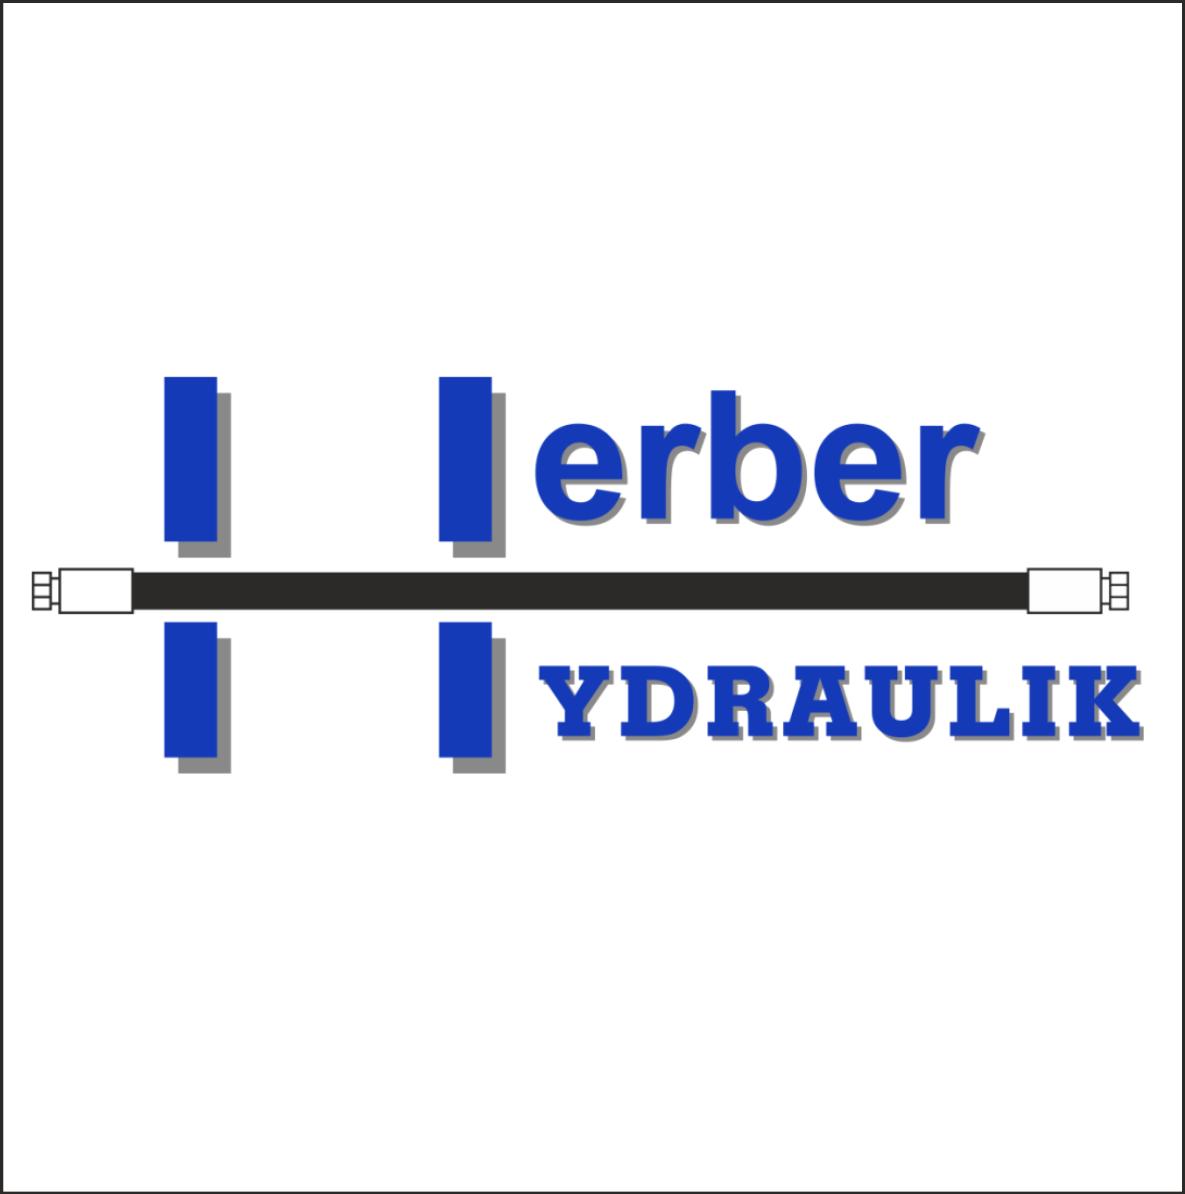 Herber GmbH